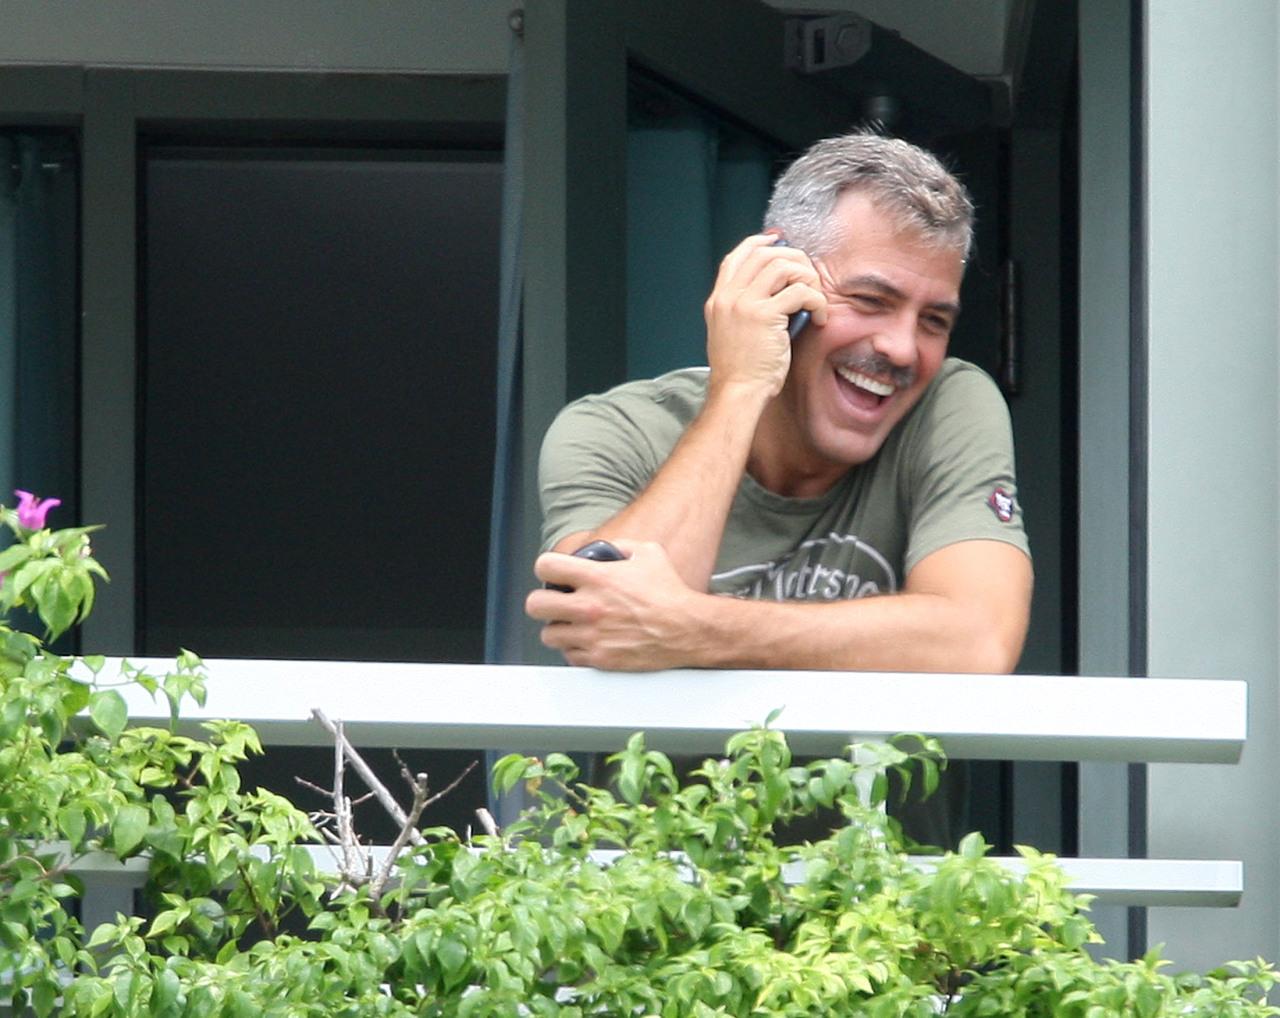 George Clooney George Clooney George Clooney! Tumblr_msfk4xqYPN1sblz9yo3_1280